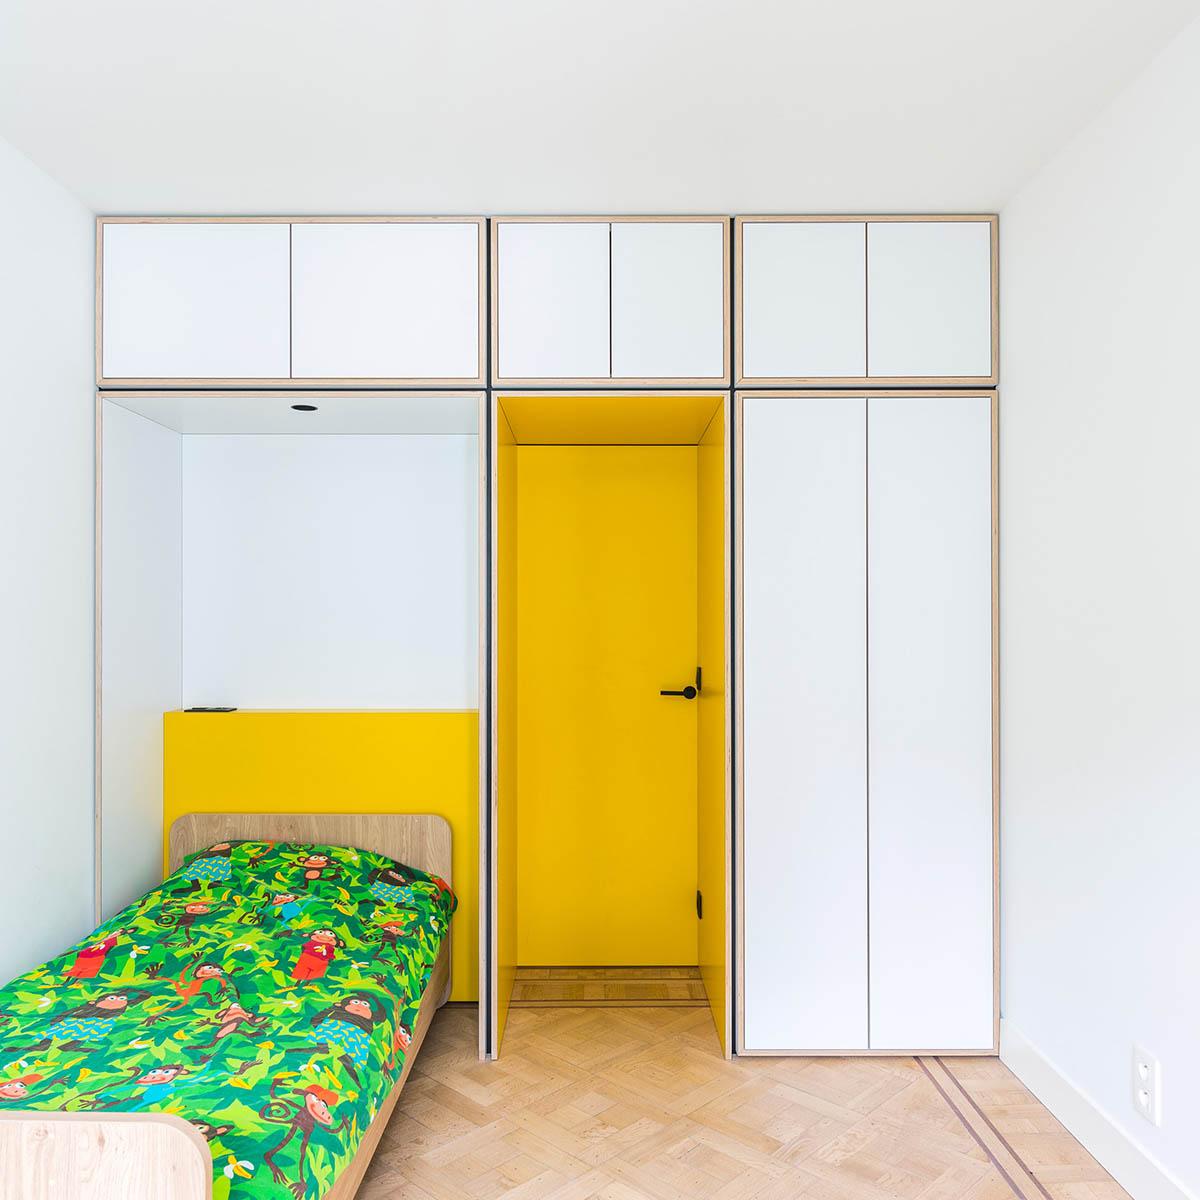 dEP-House-Van-Staeyen-Interieur-Architecten-05